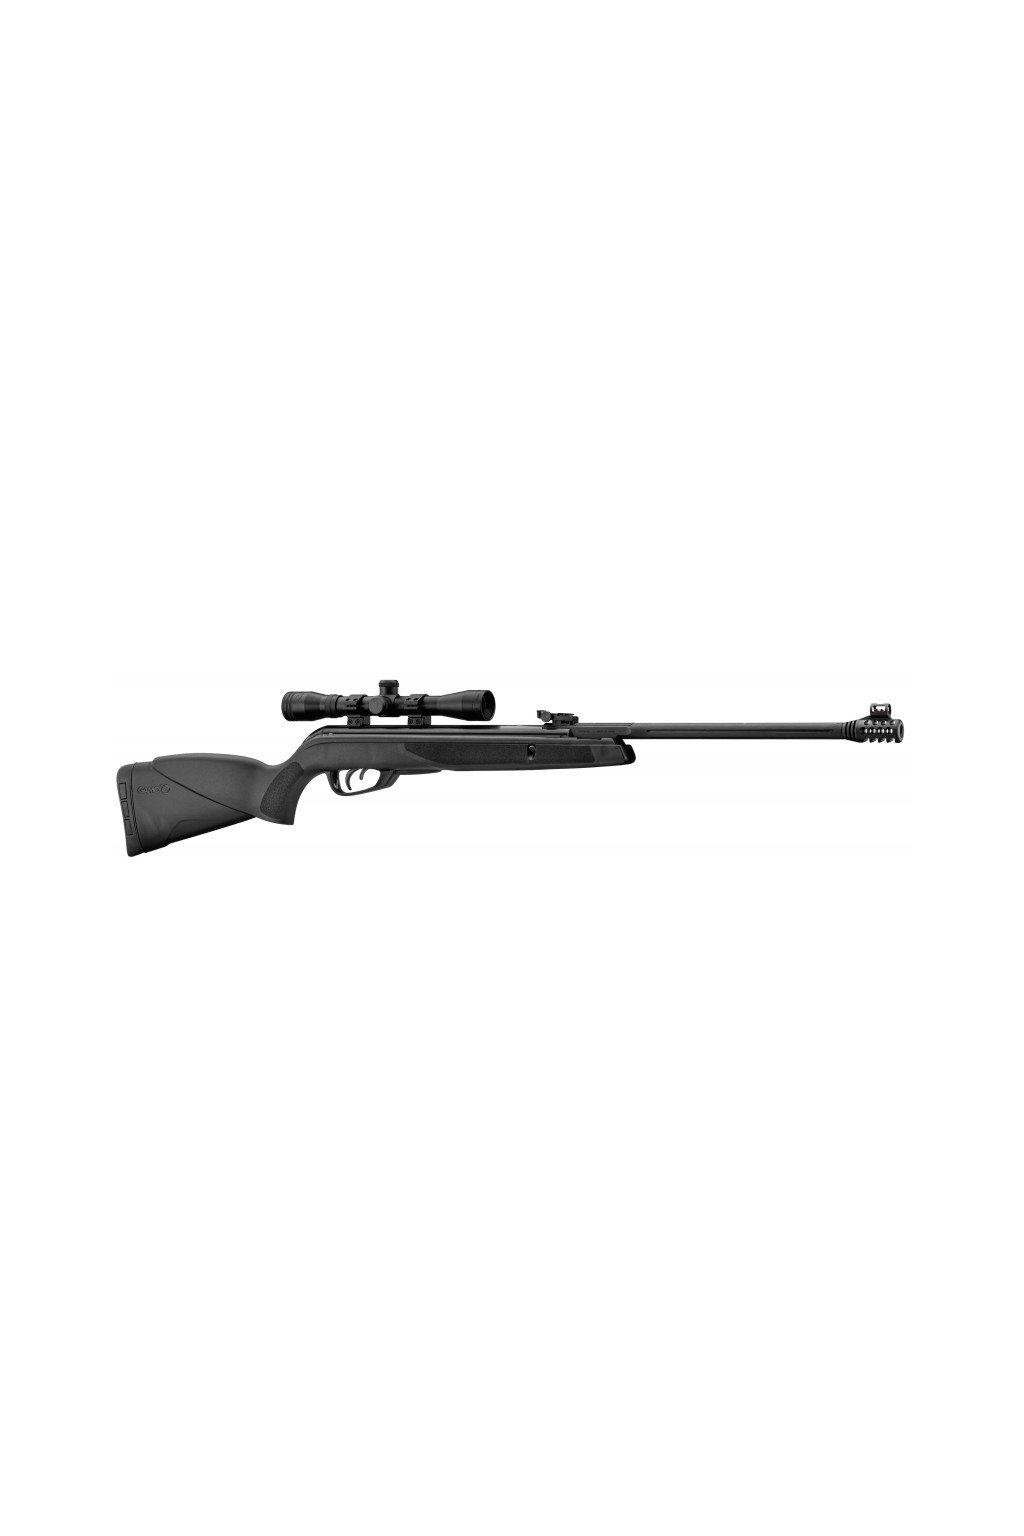 carabine gamo black bear 4x32 wr